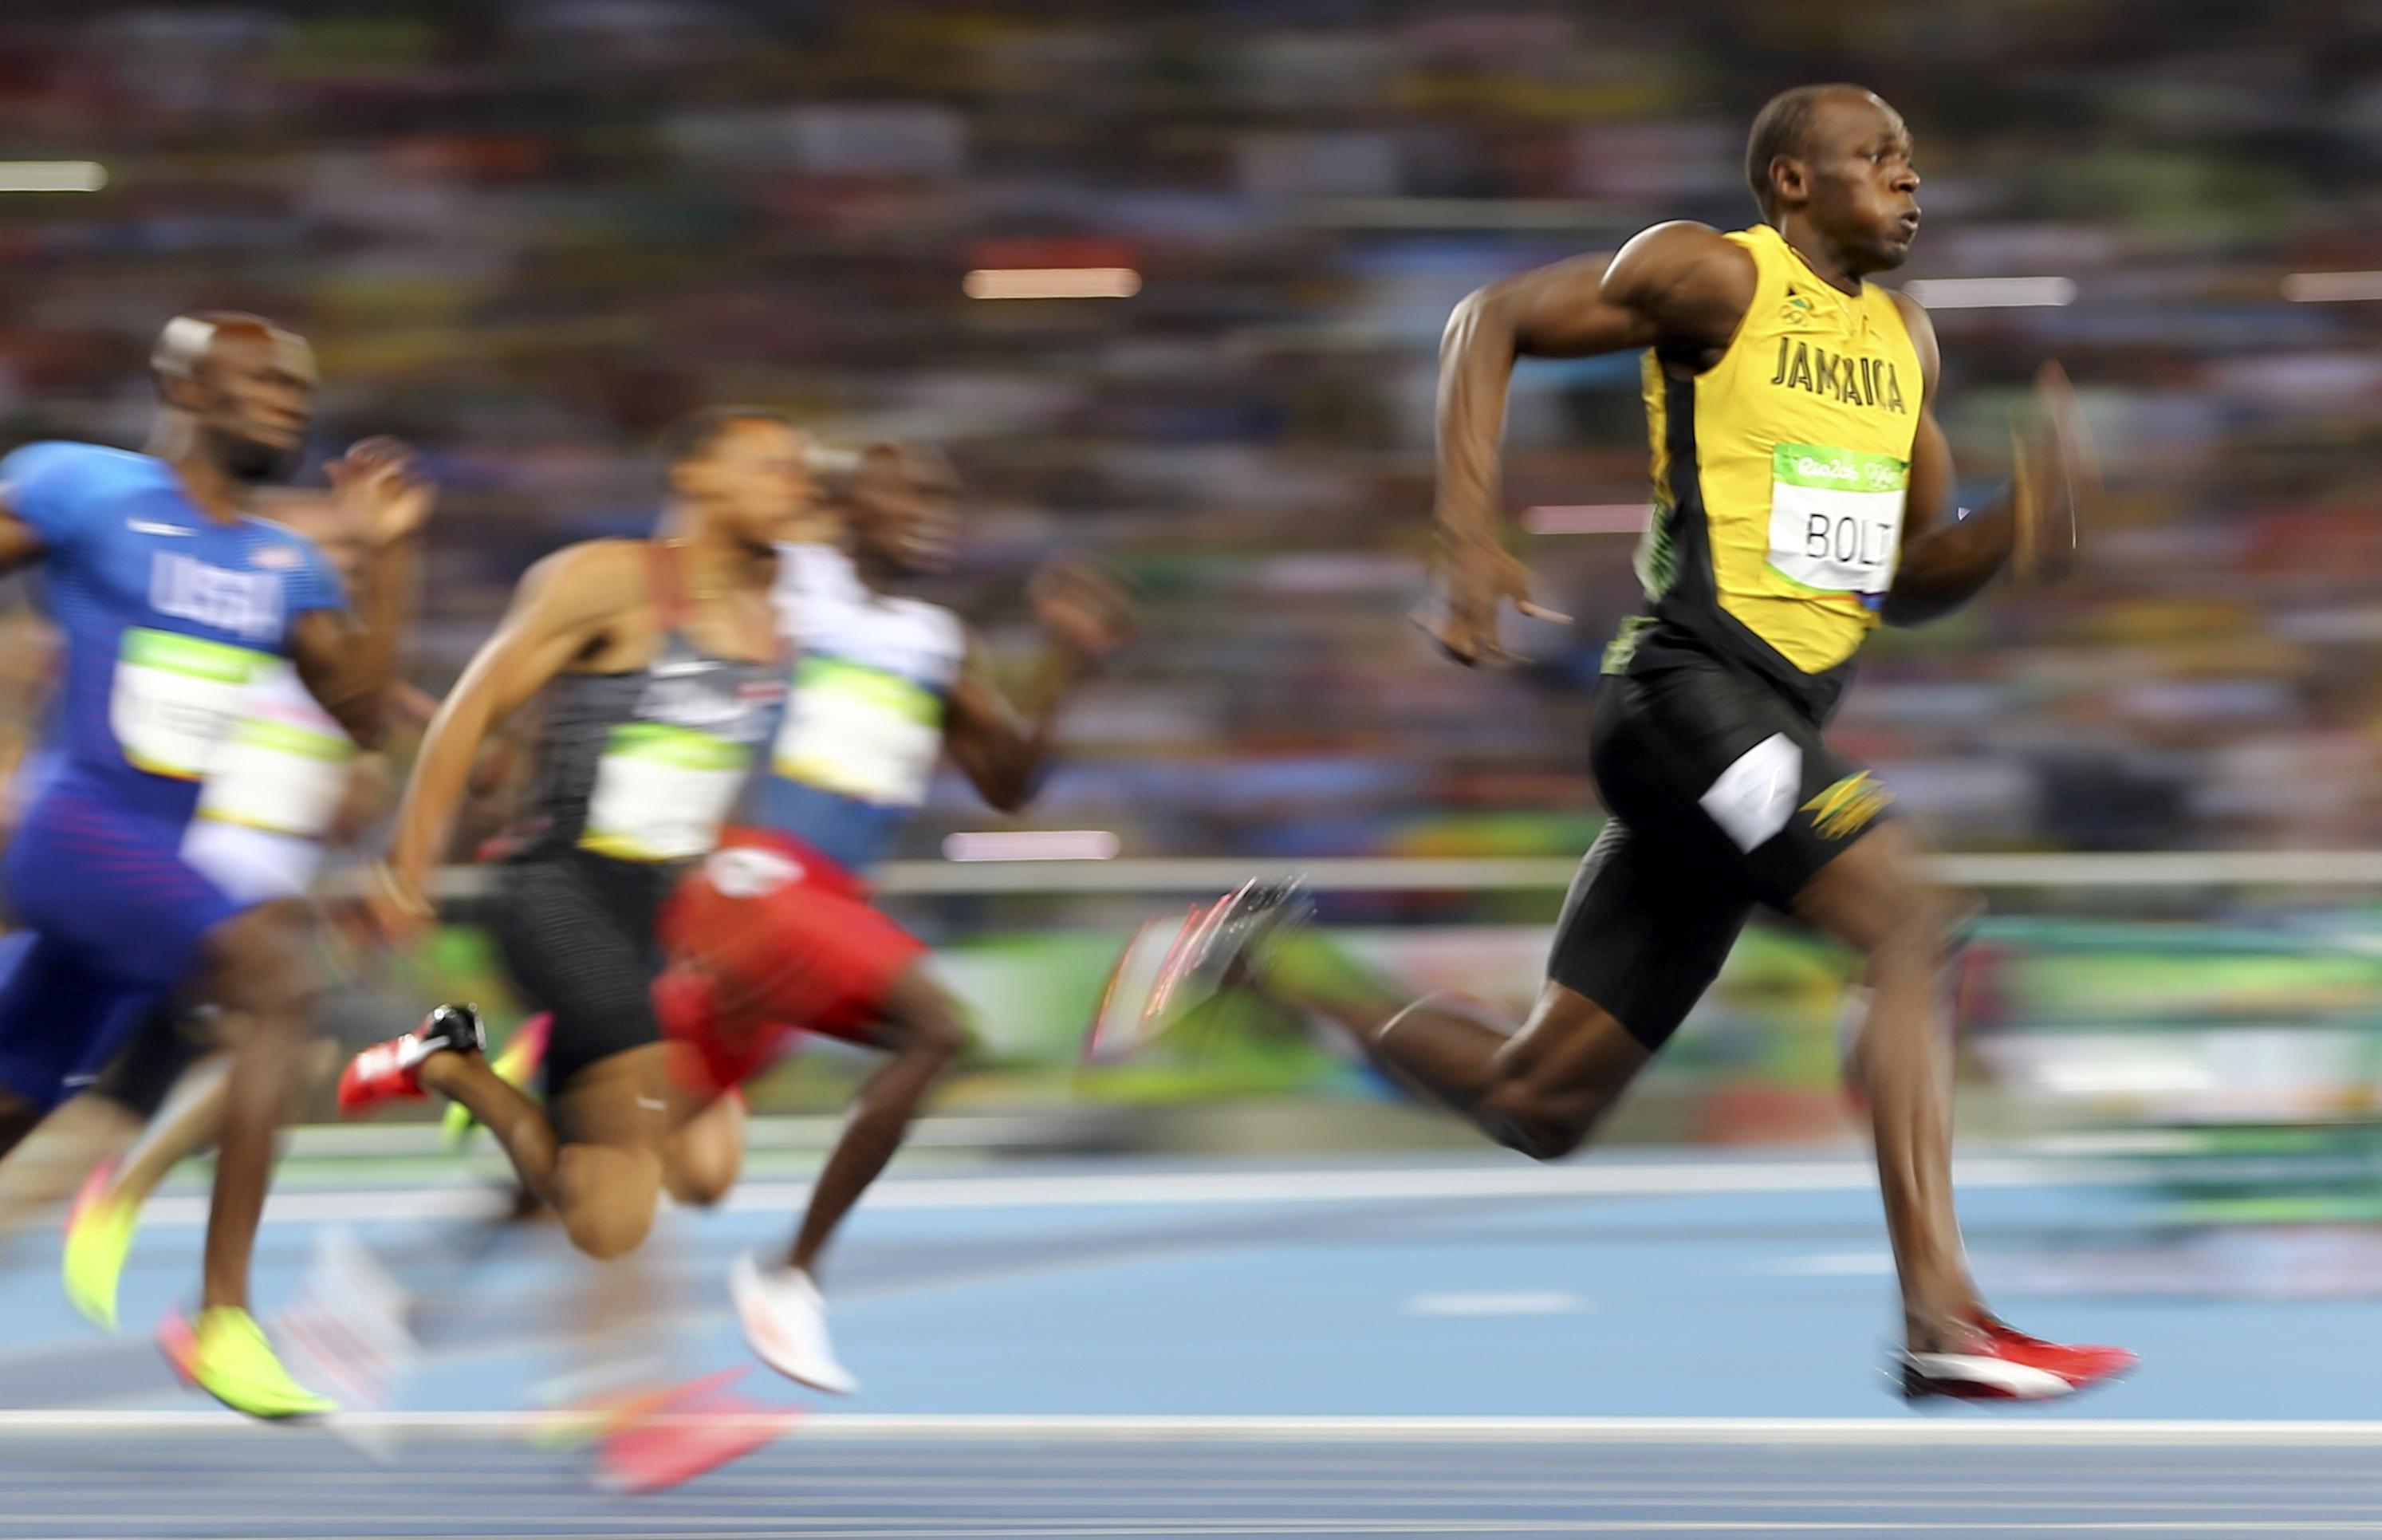 Piernas y glúteos   Usain Bolt